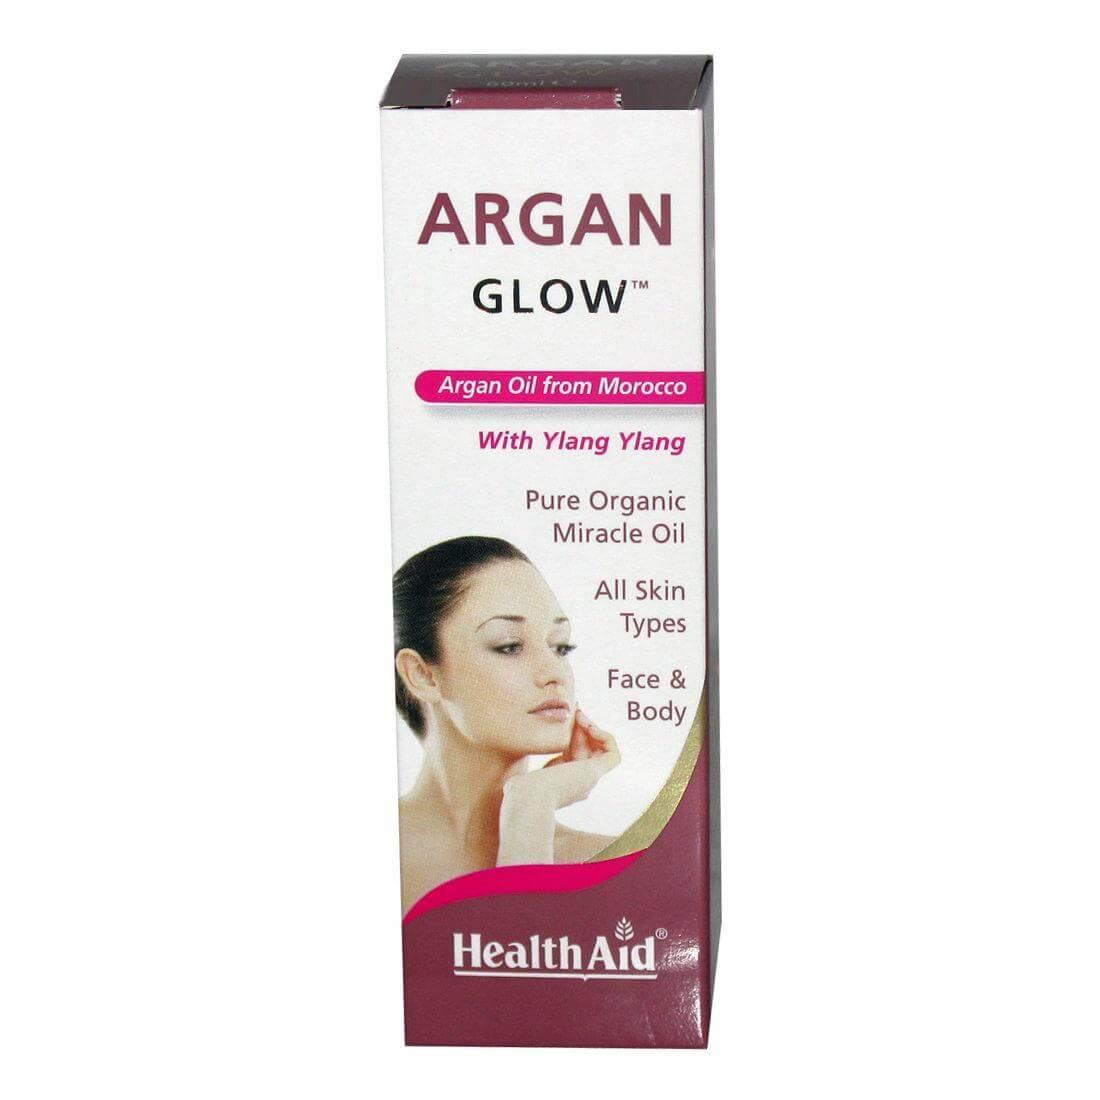 Health Aid Argan Glow Argan Oil Ylang Ylang Οργανικό Έλαιο Αργκάν Προσώπου Σώματος Όλοι οι Τύποι Δέρματος 60ml